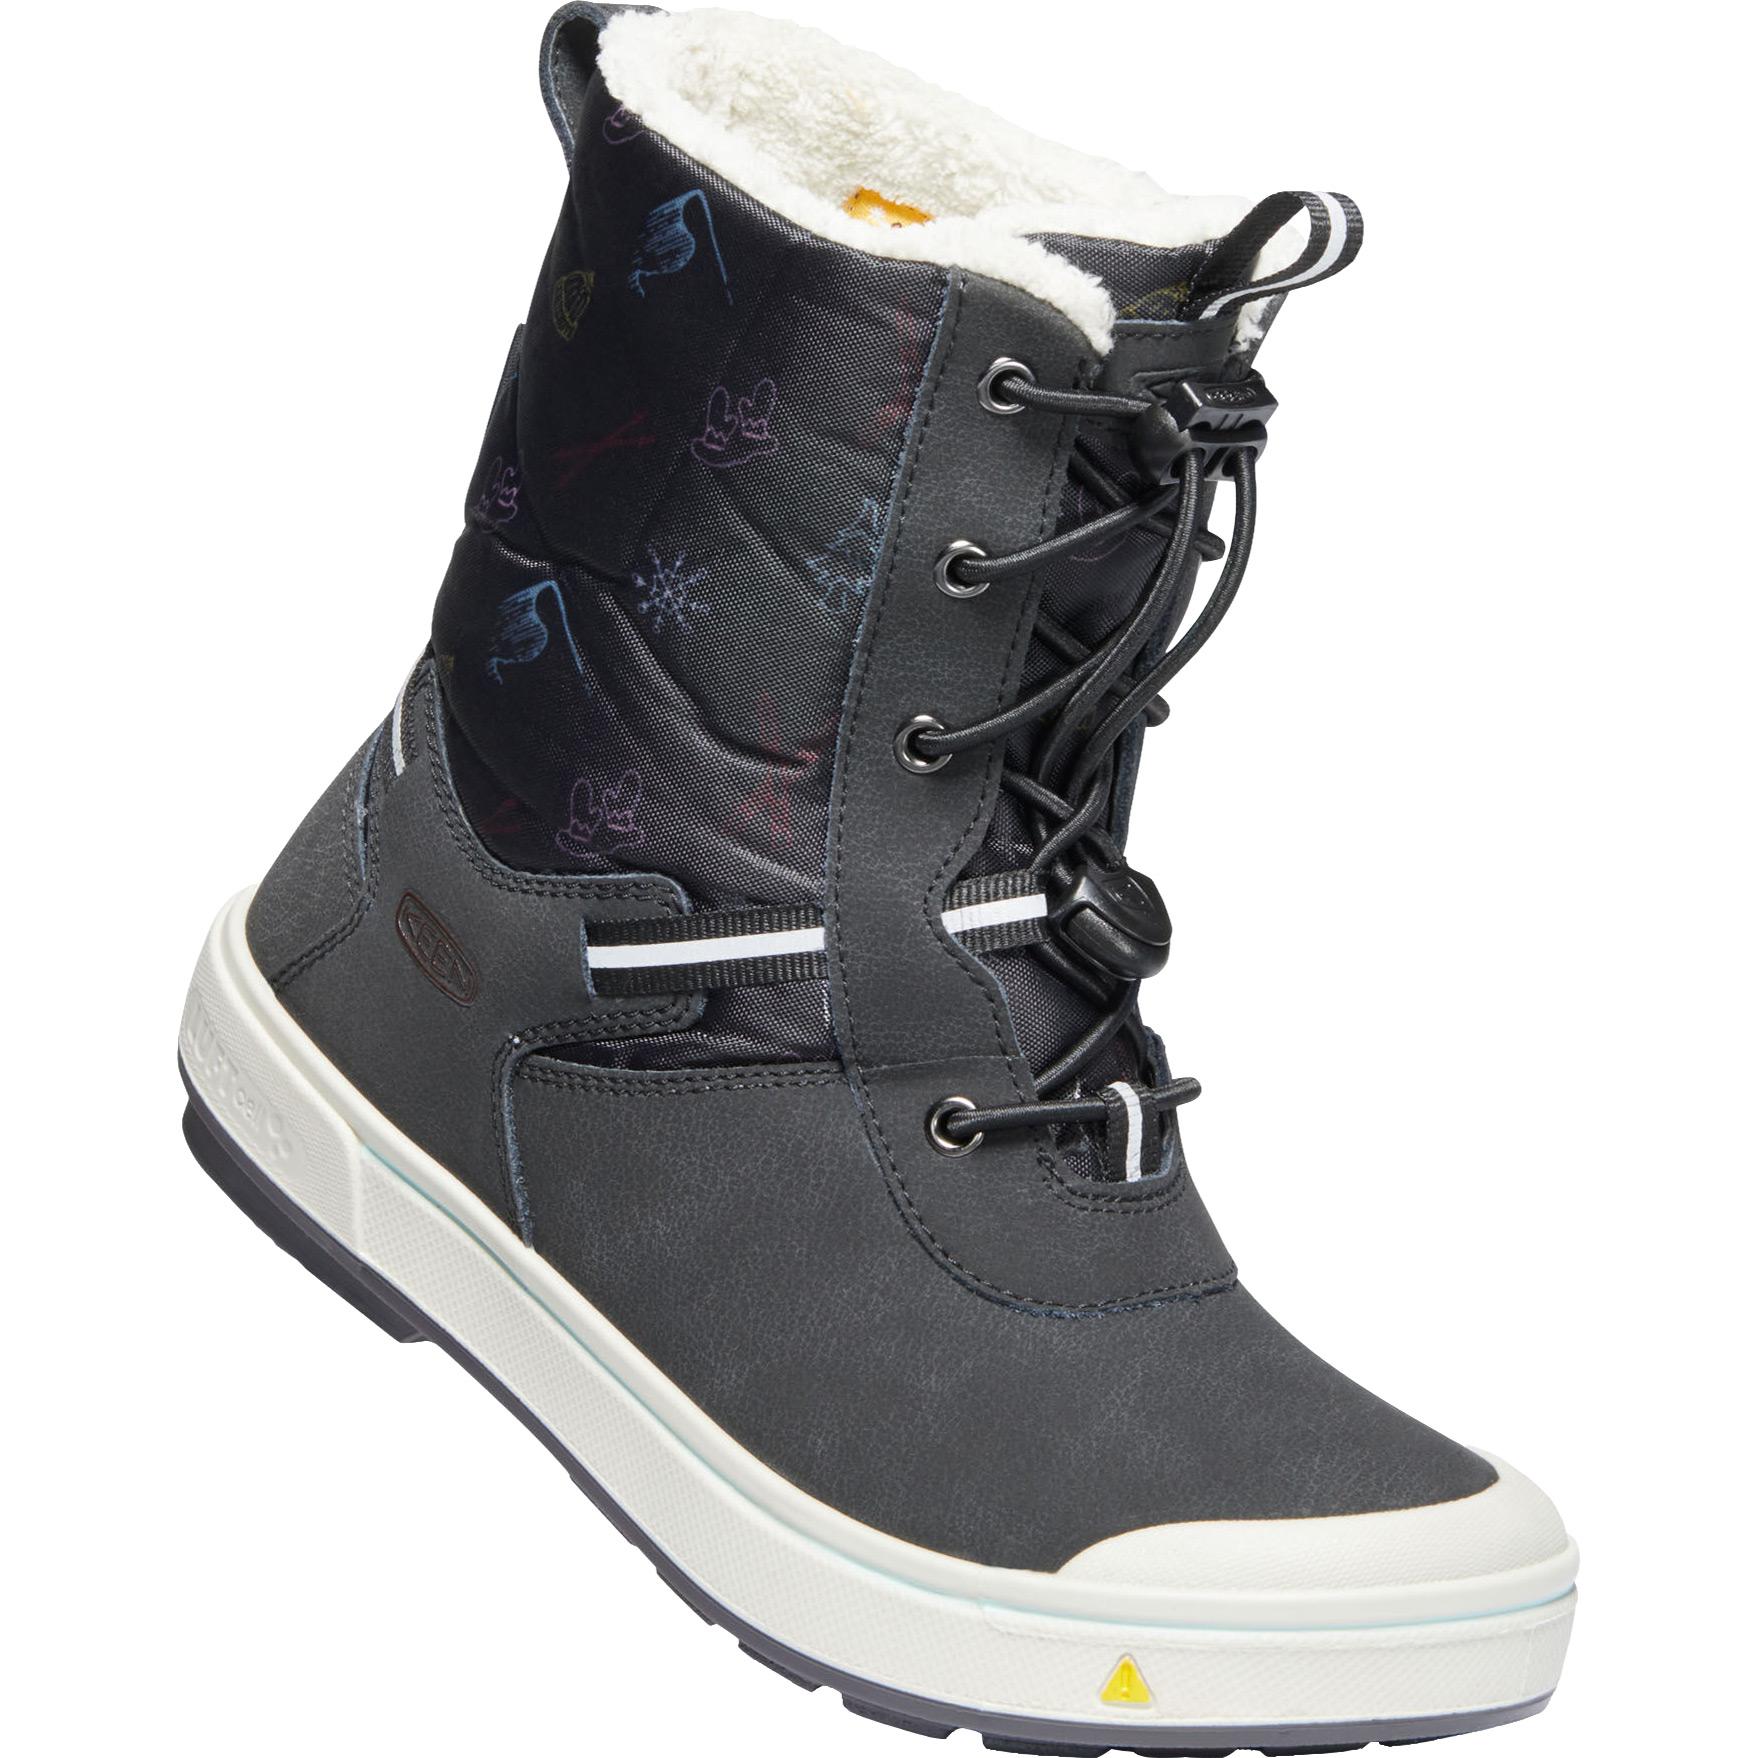 KEEN Kelsa Tall Waterproof Youth Winter Boots - Black / Tibetan Red